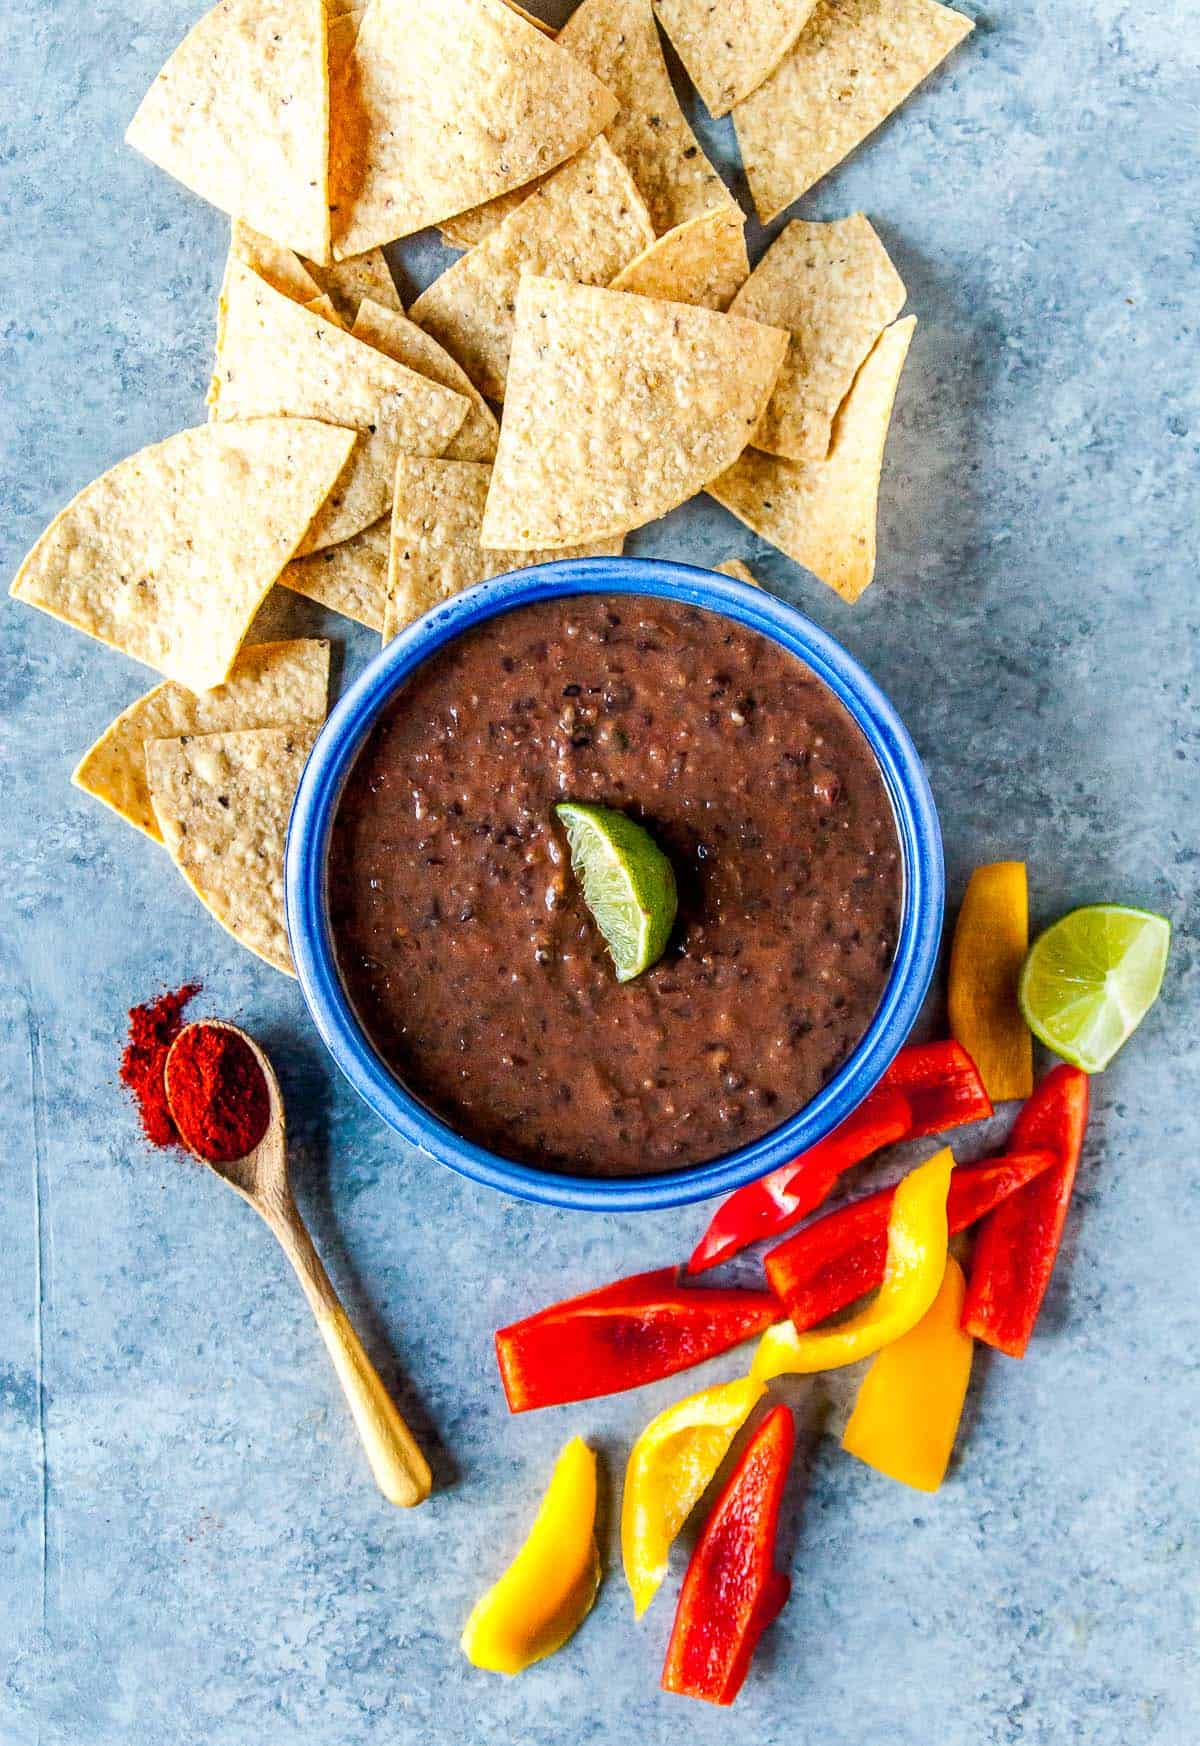 vegan black bean dip in a bowl with chips